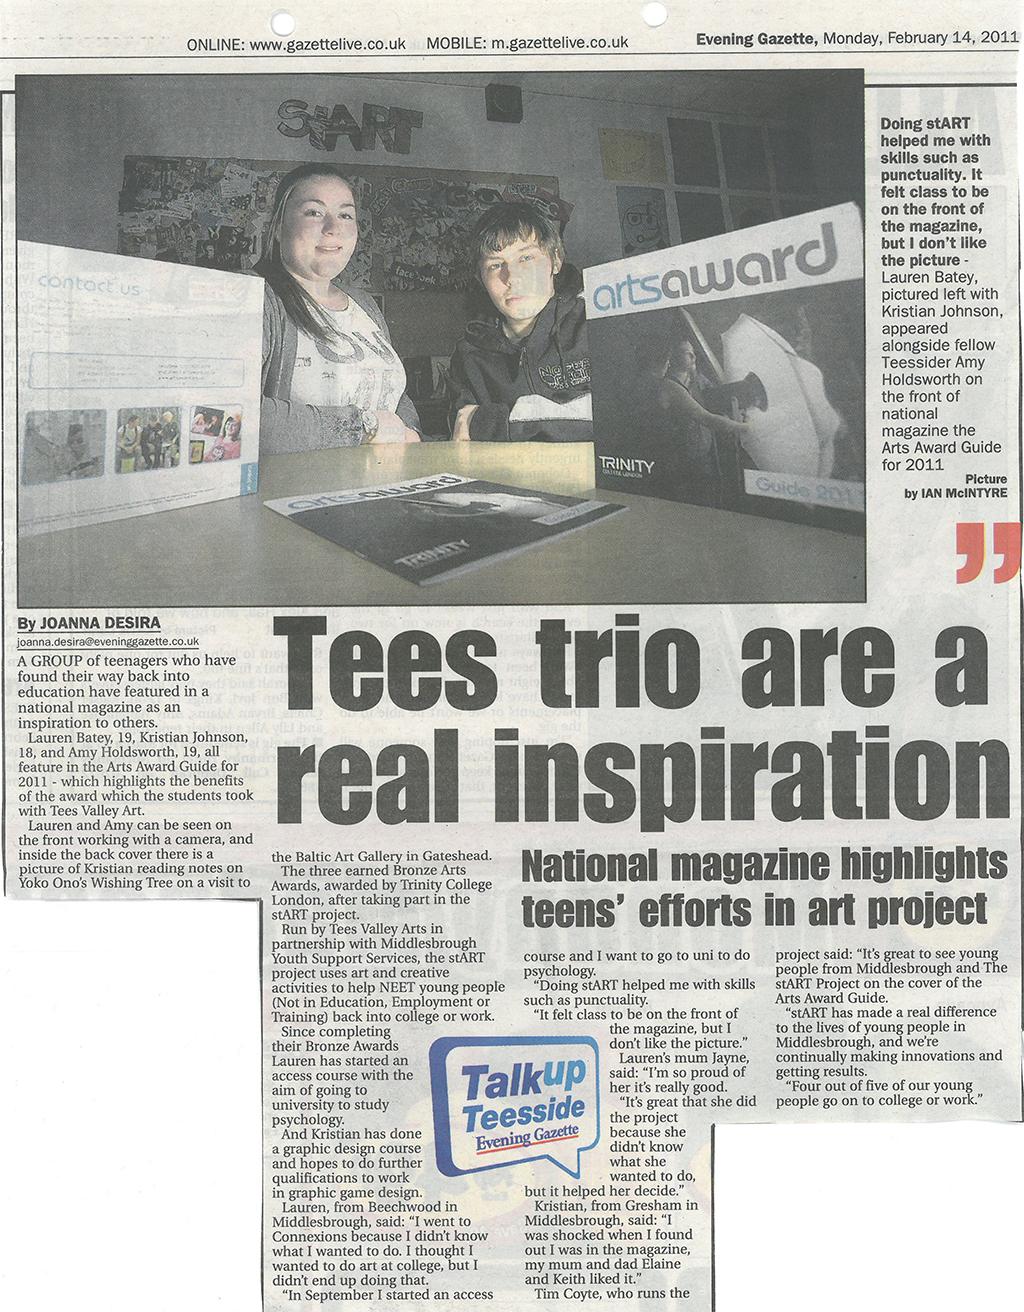 2011-02-14, Evening Gazette